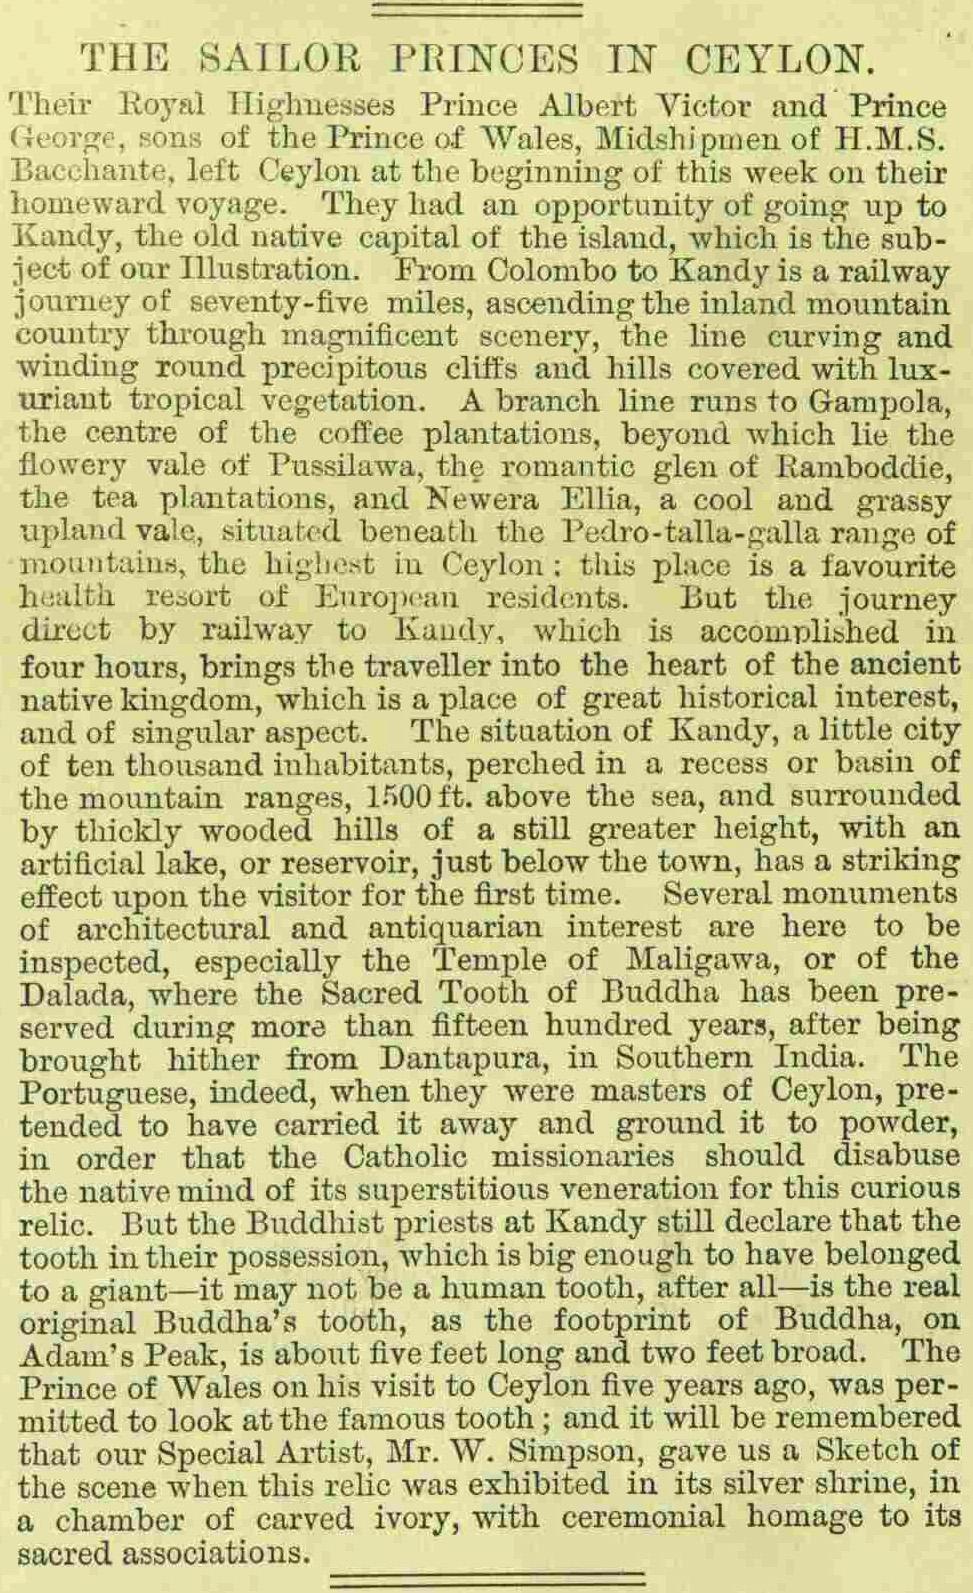 40.The Sailor Princes in Ceylon - Princes Albert Victor & George